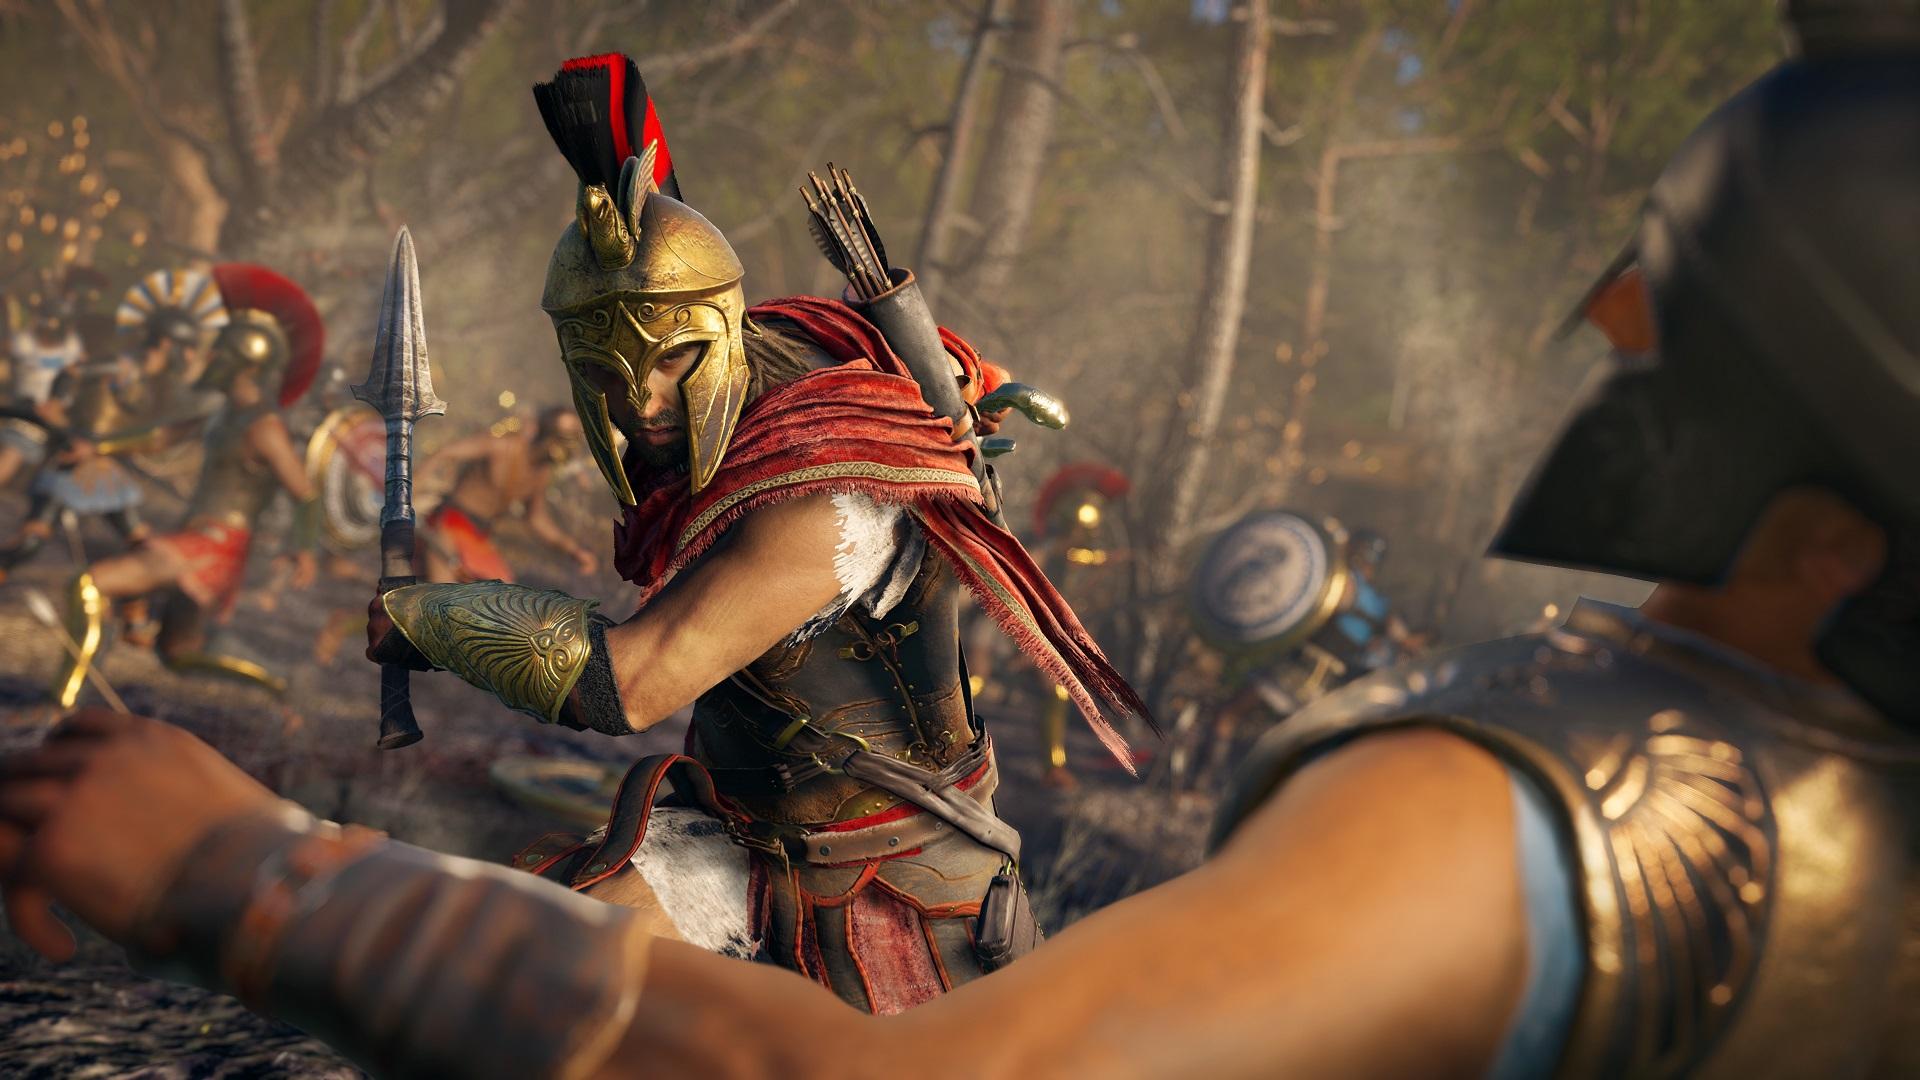 Assassin's Creed Odyssey has some magnificent big team battles screenshot